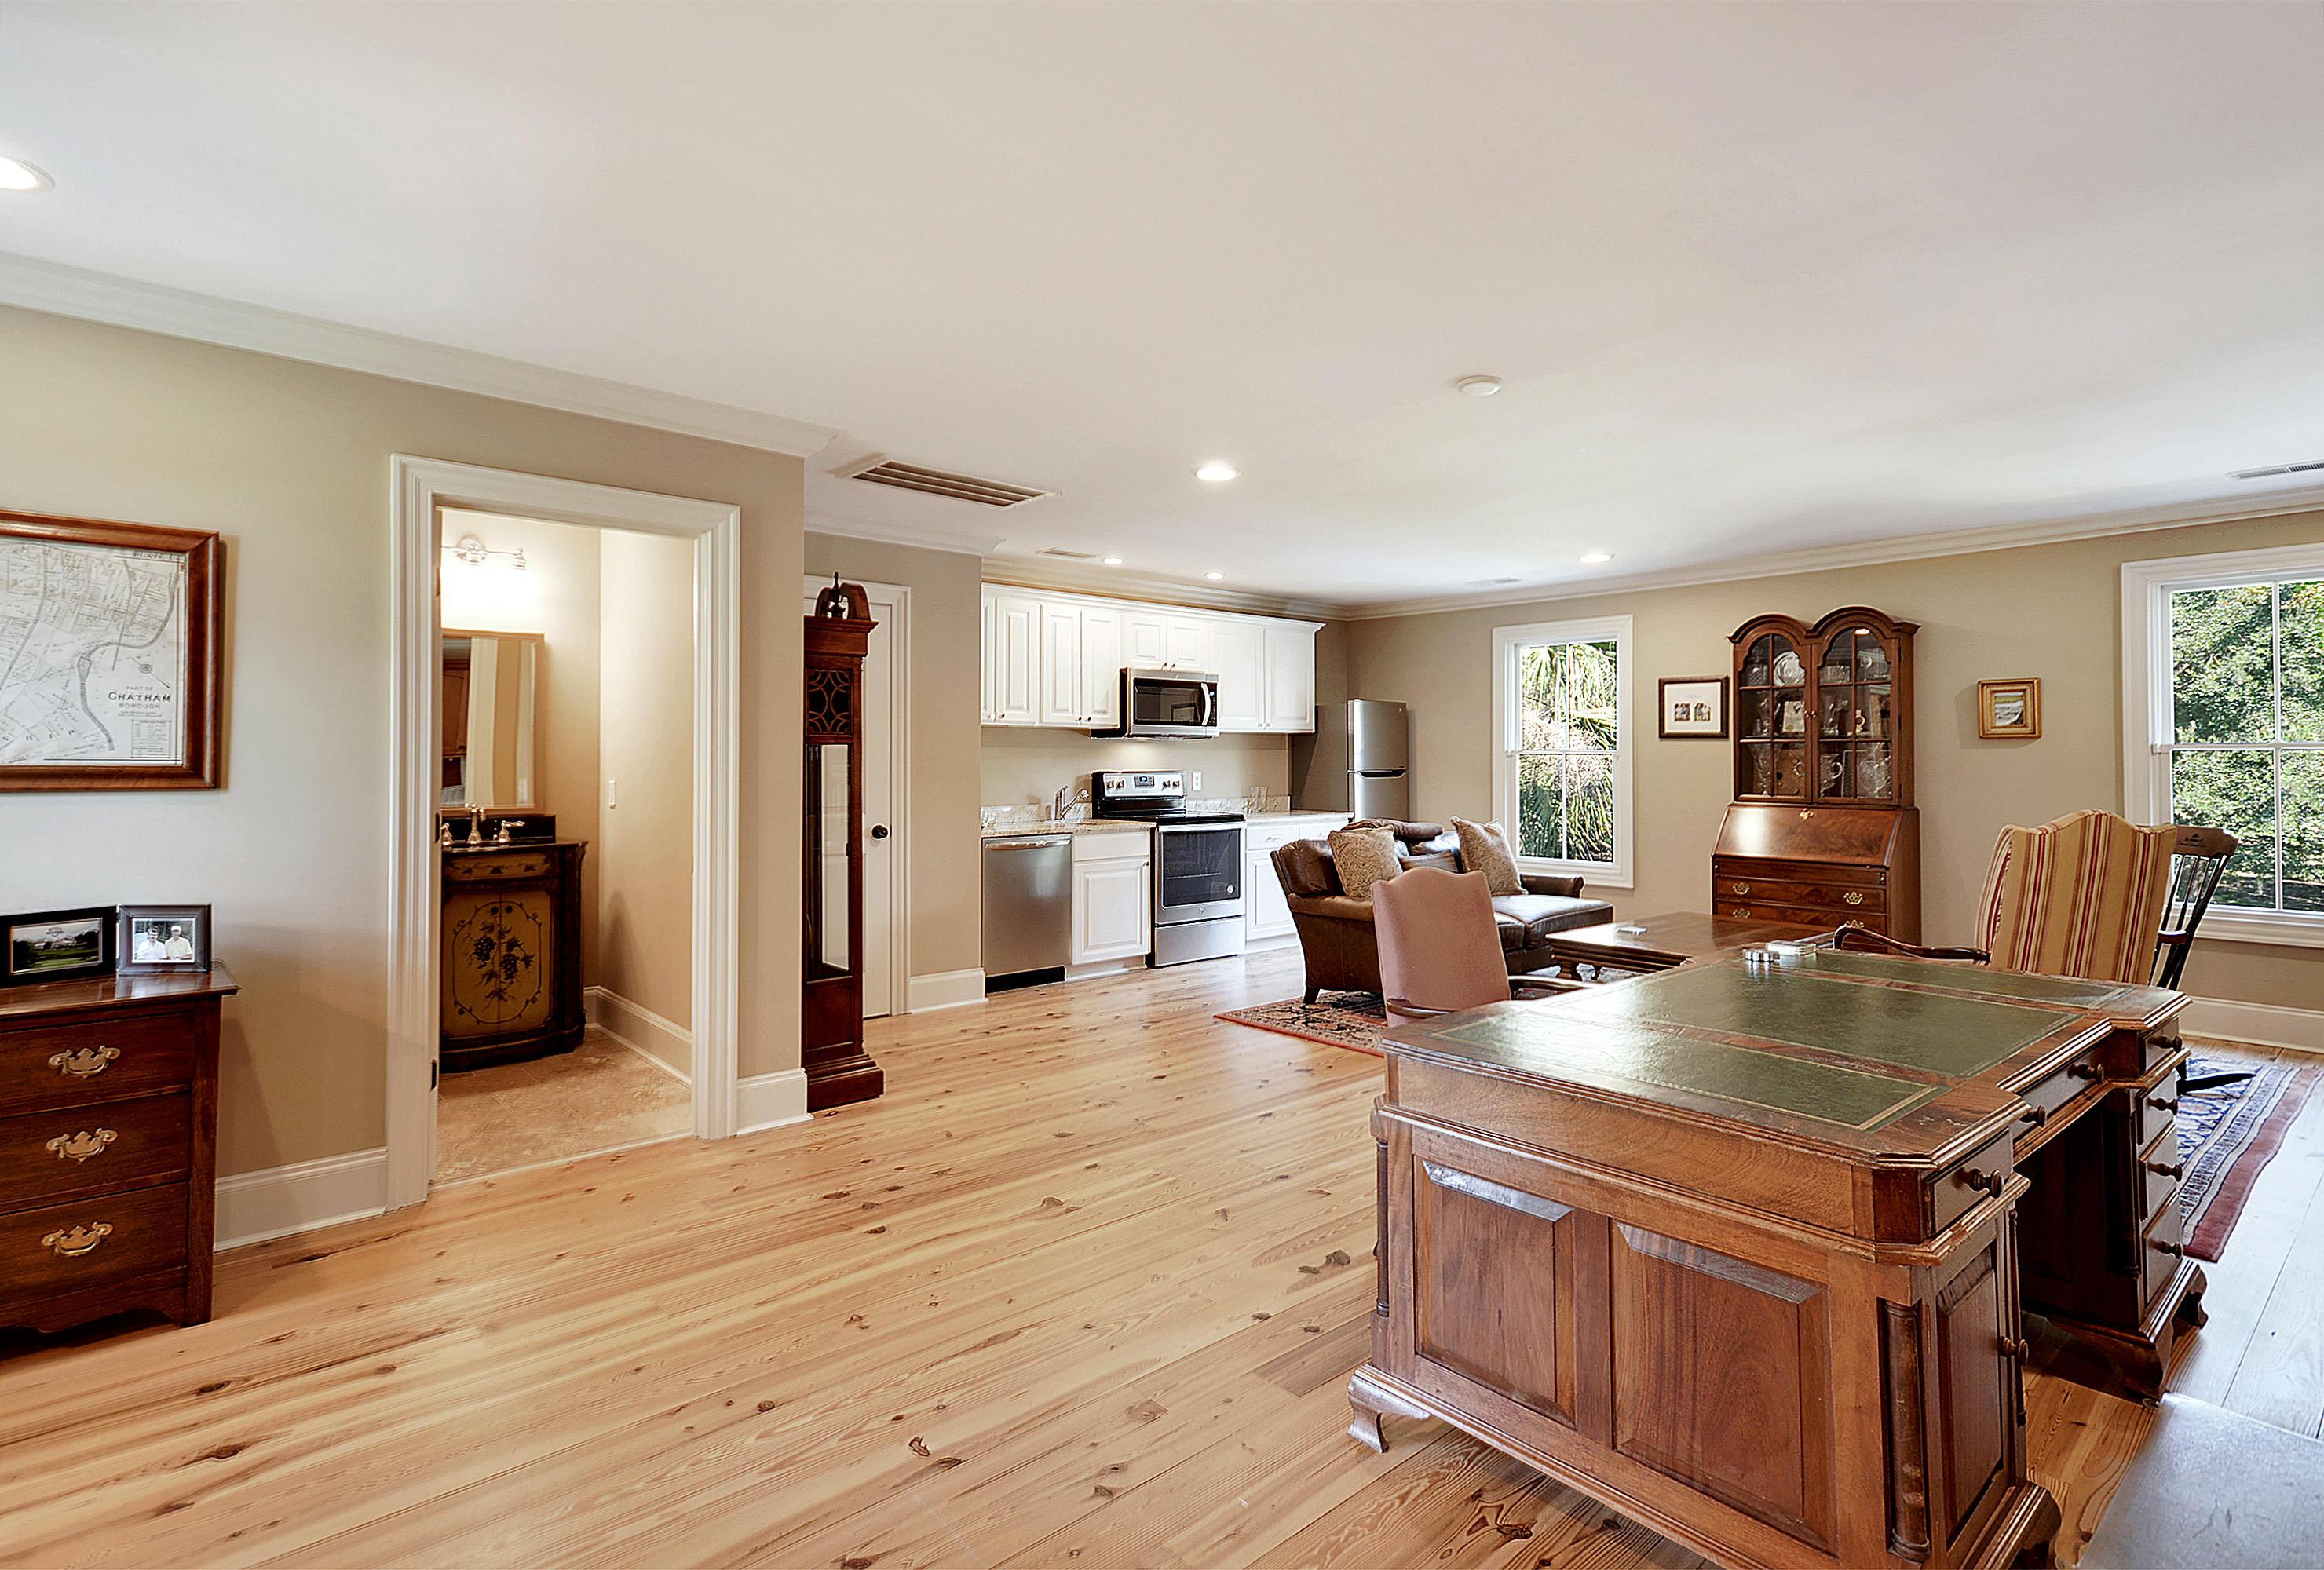 Daniel Island Homes For Sale - 27 Watroo, Charleston, SC - 56